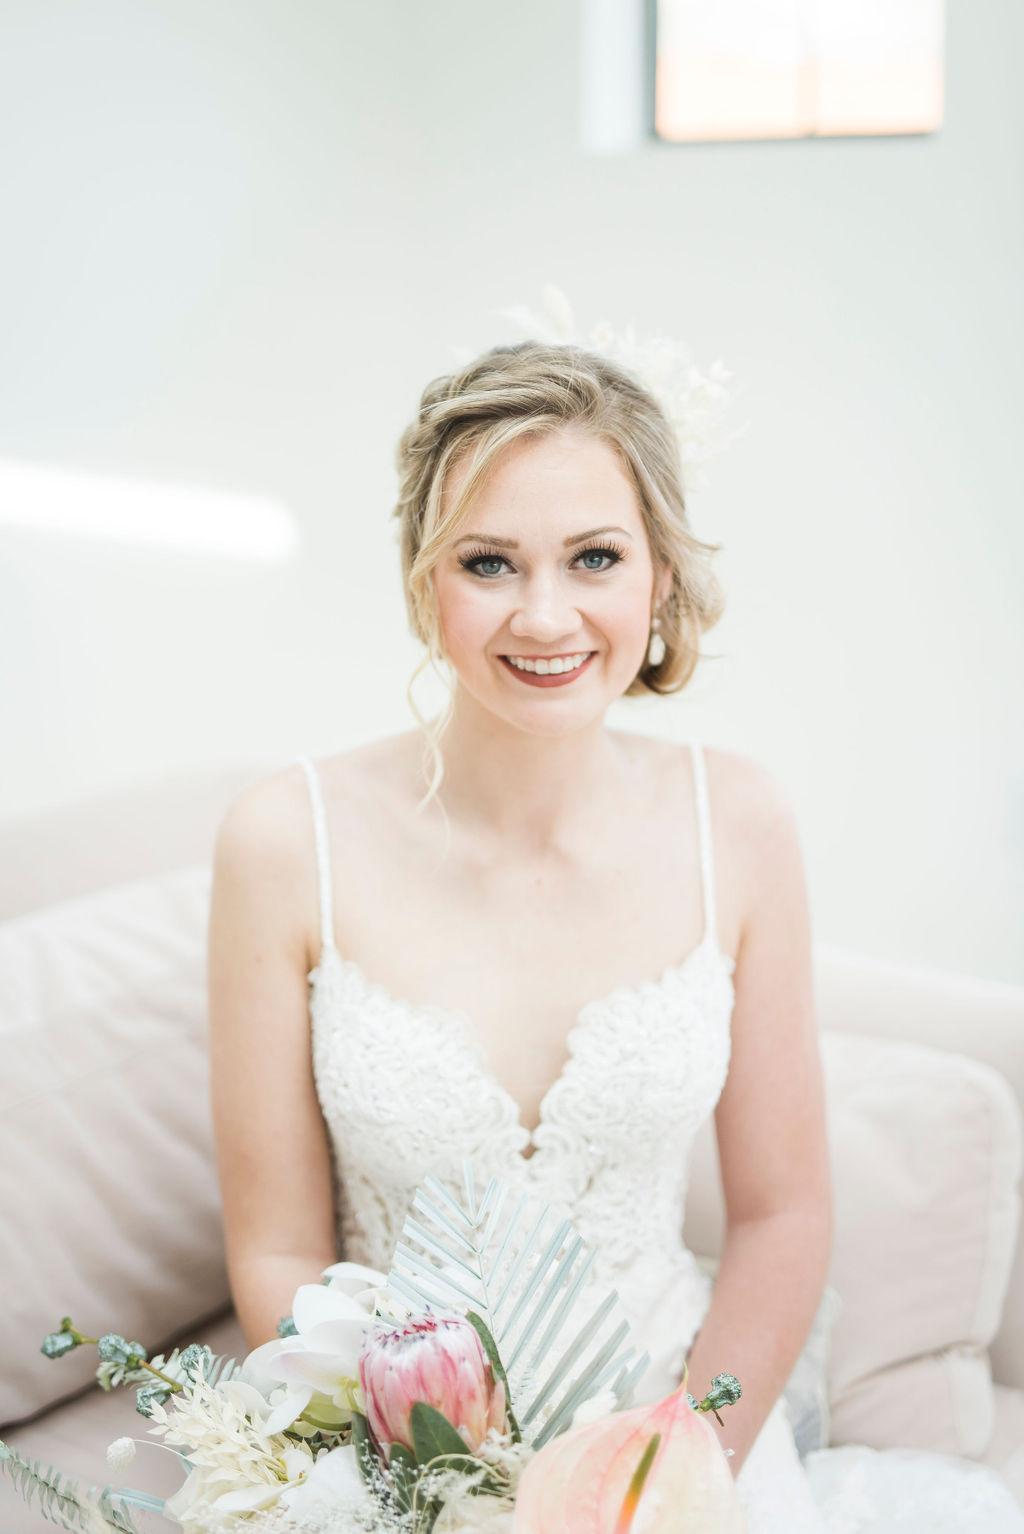 boho updo bridal makeup inspiration wedding planner epoch co